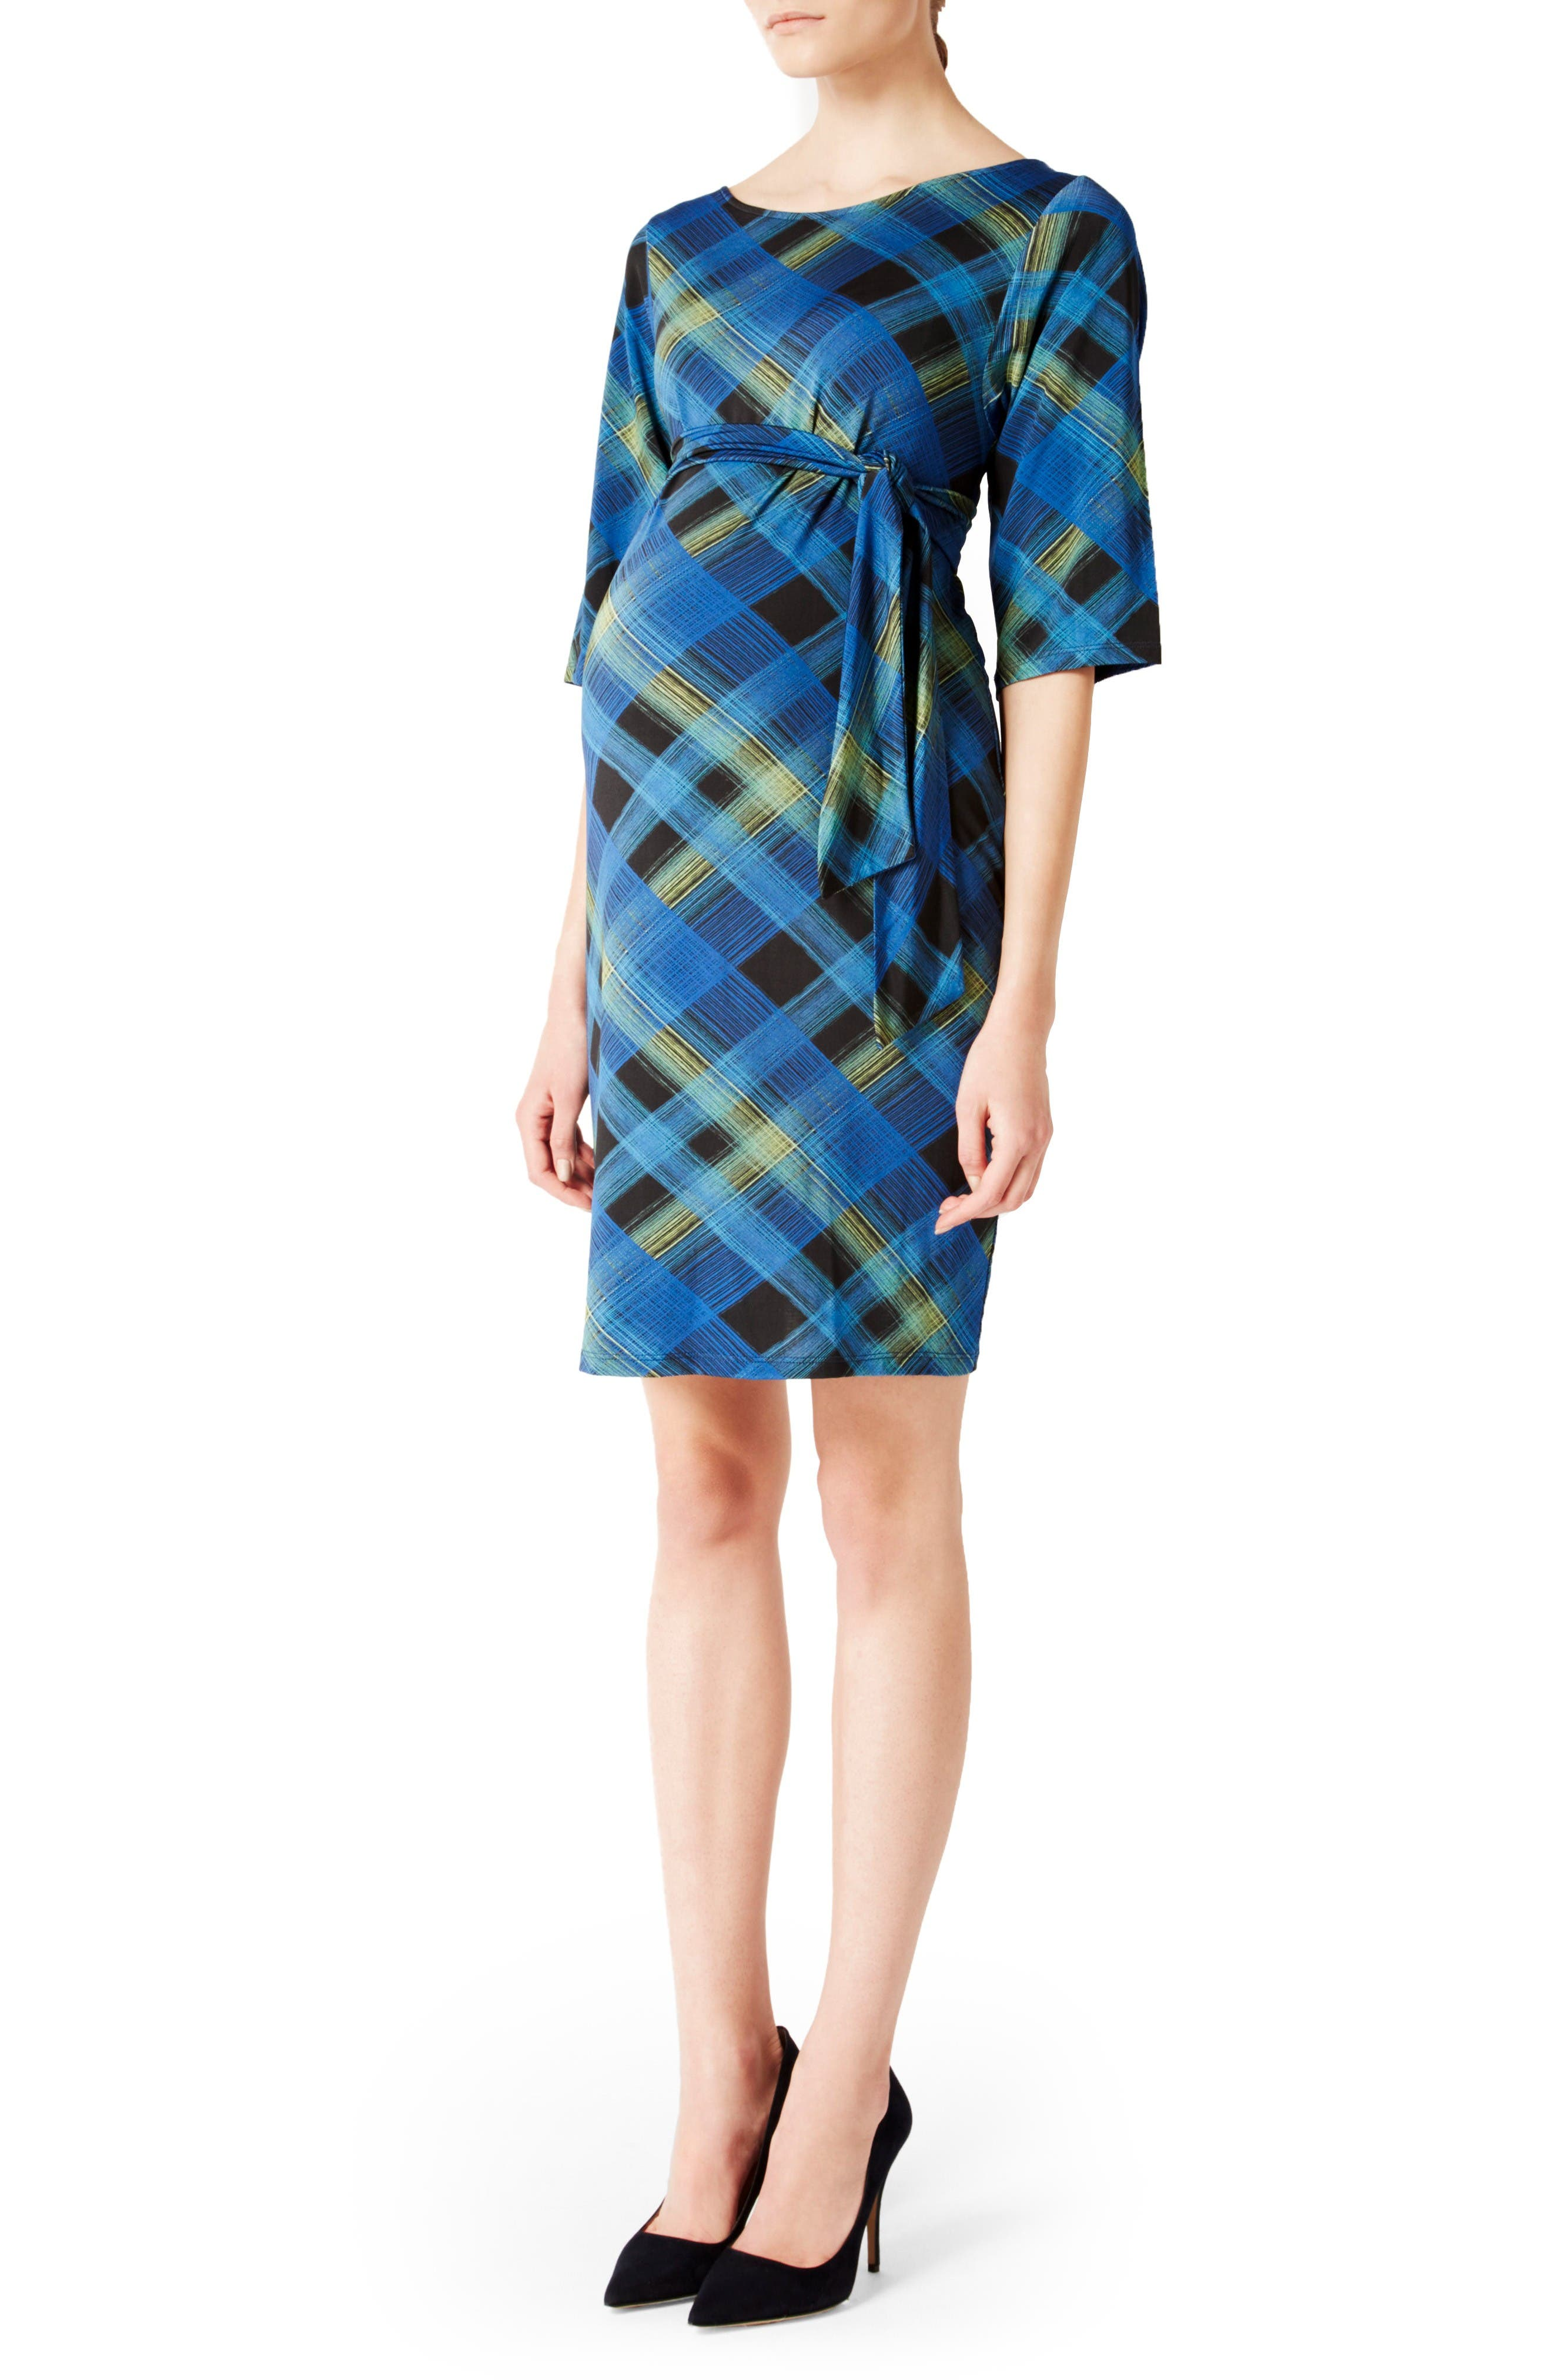 Alternate Image 1 Selected - Leota 'Nouveau' Sheath Maternity Dress